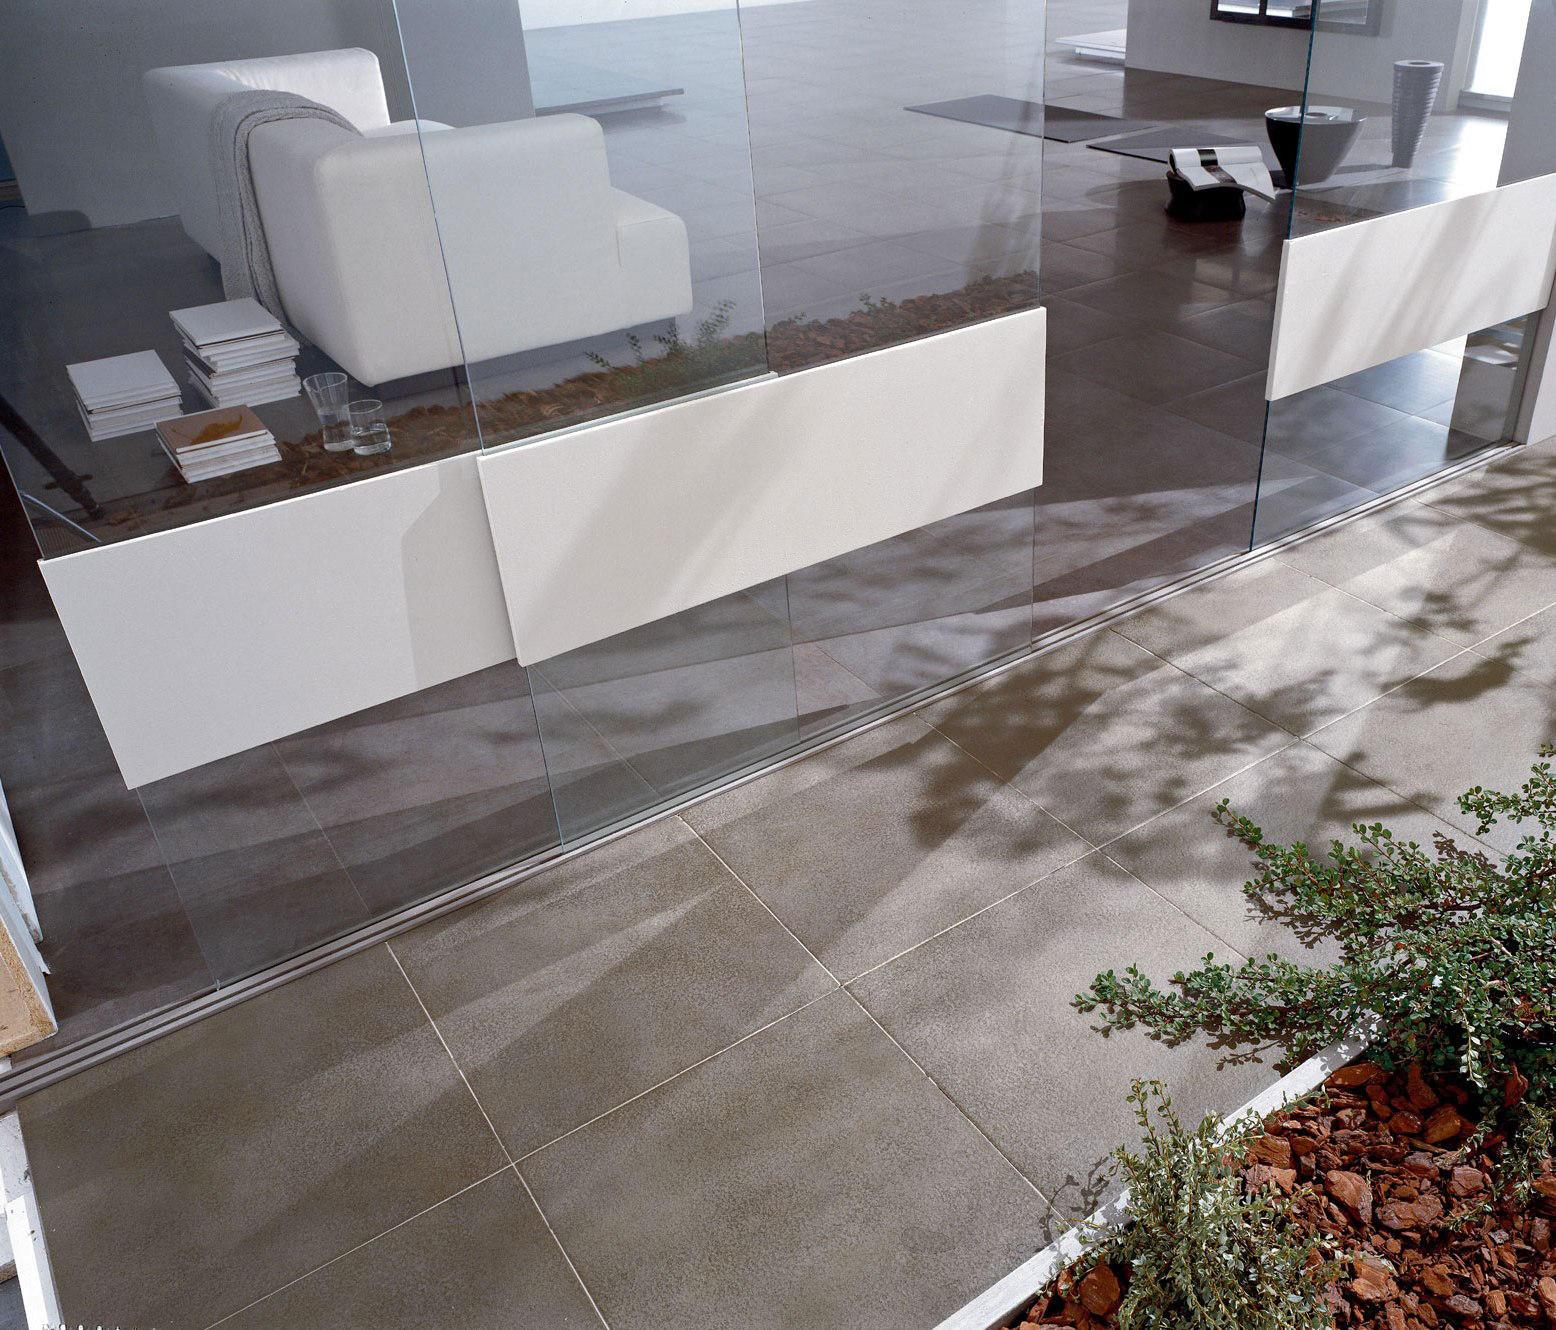 avantgarde blanc floor tile tiles from refin architonic. Black Bedroom Furniture Sets. Home Design Ideas